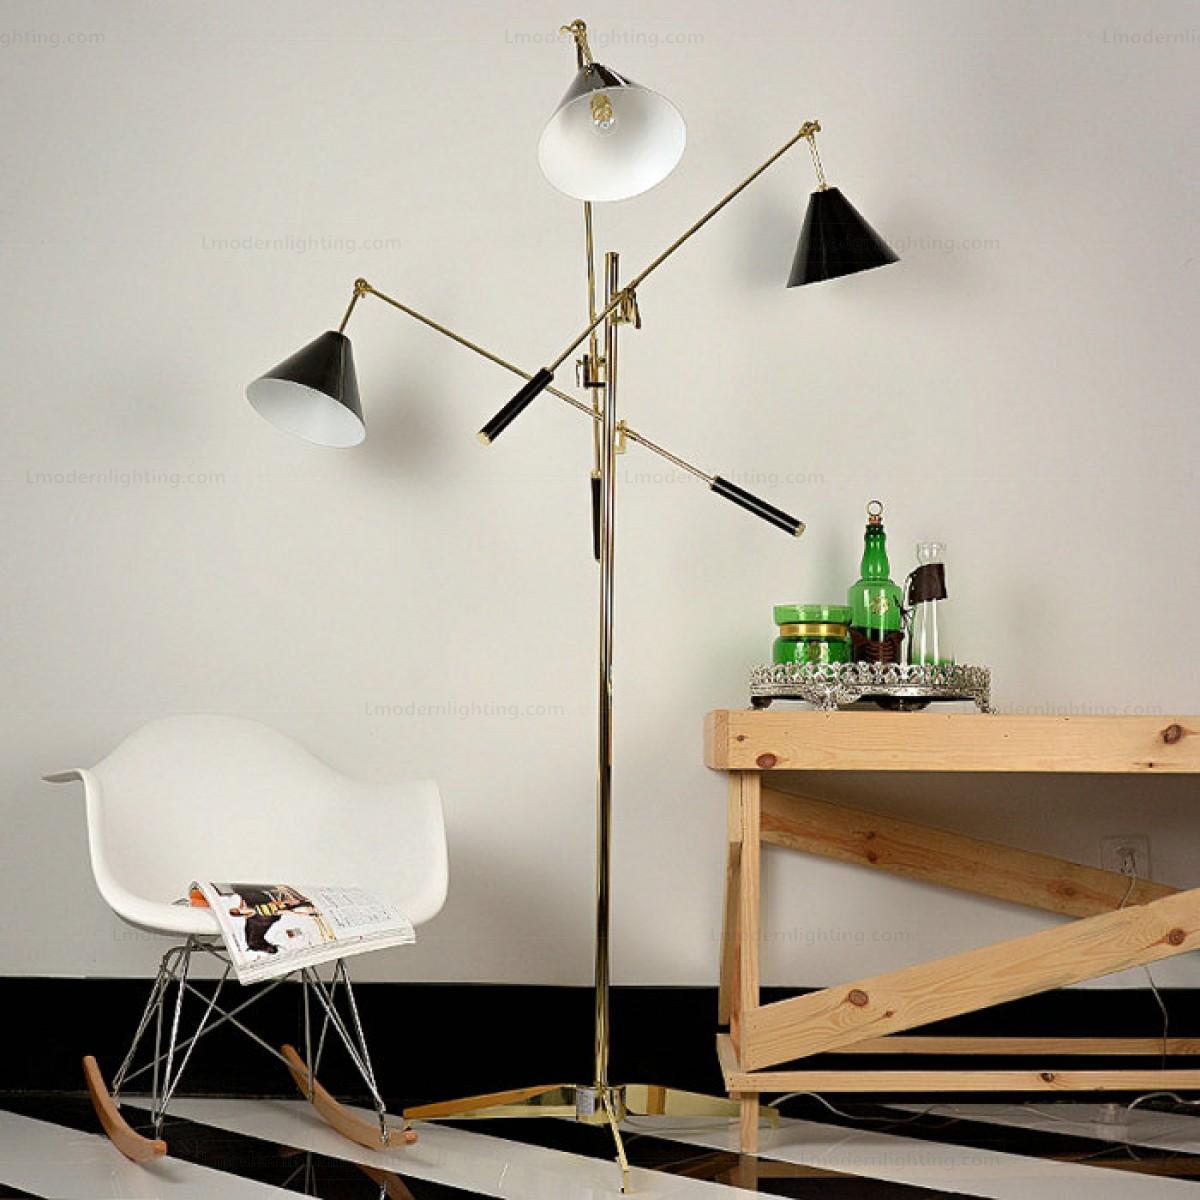 Maison et Objet maison et objet Maison et Objet 2019 Gives You The Best Modern Floor Lamps! delightfull sinatra floor lamp08